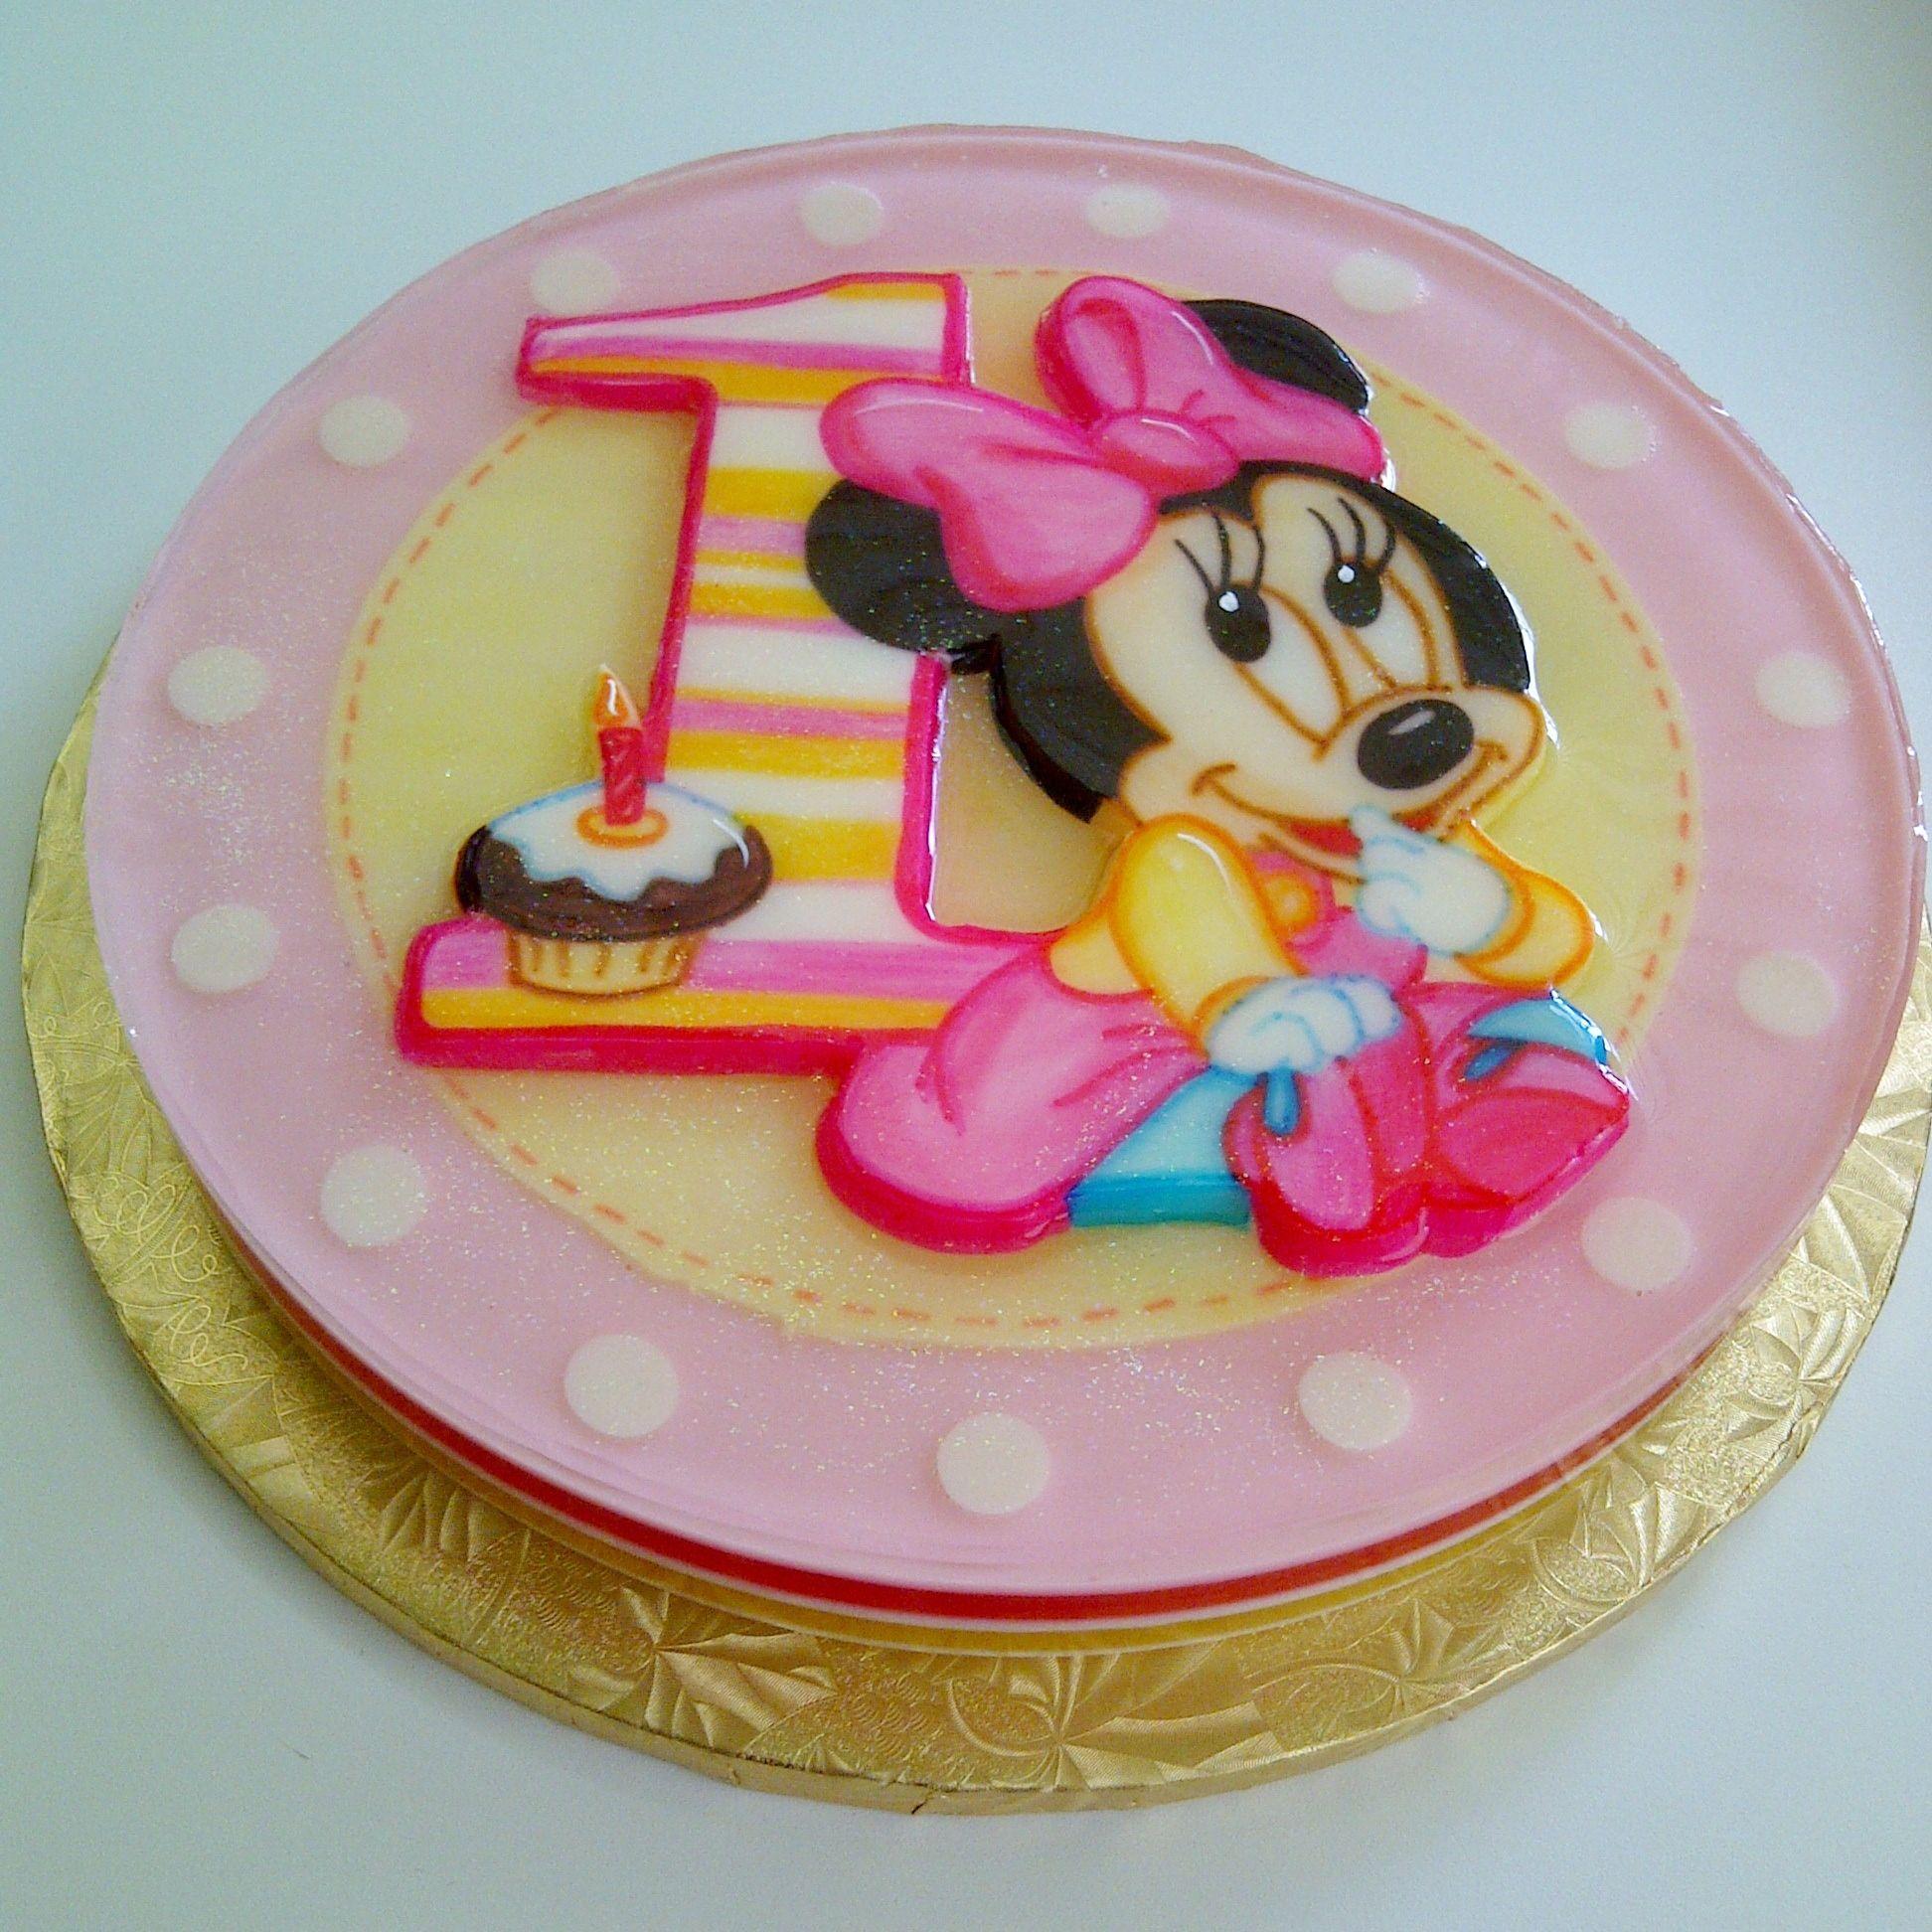 Baby Minnie Mouse Gelatin | Gelatin | Pinterest | Ratones, Bebé y ...